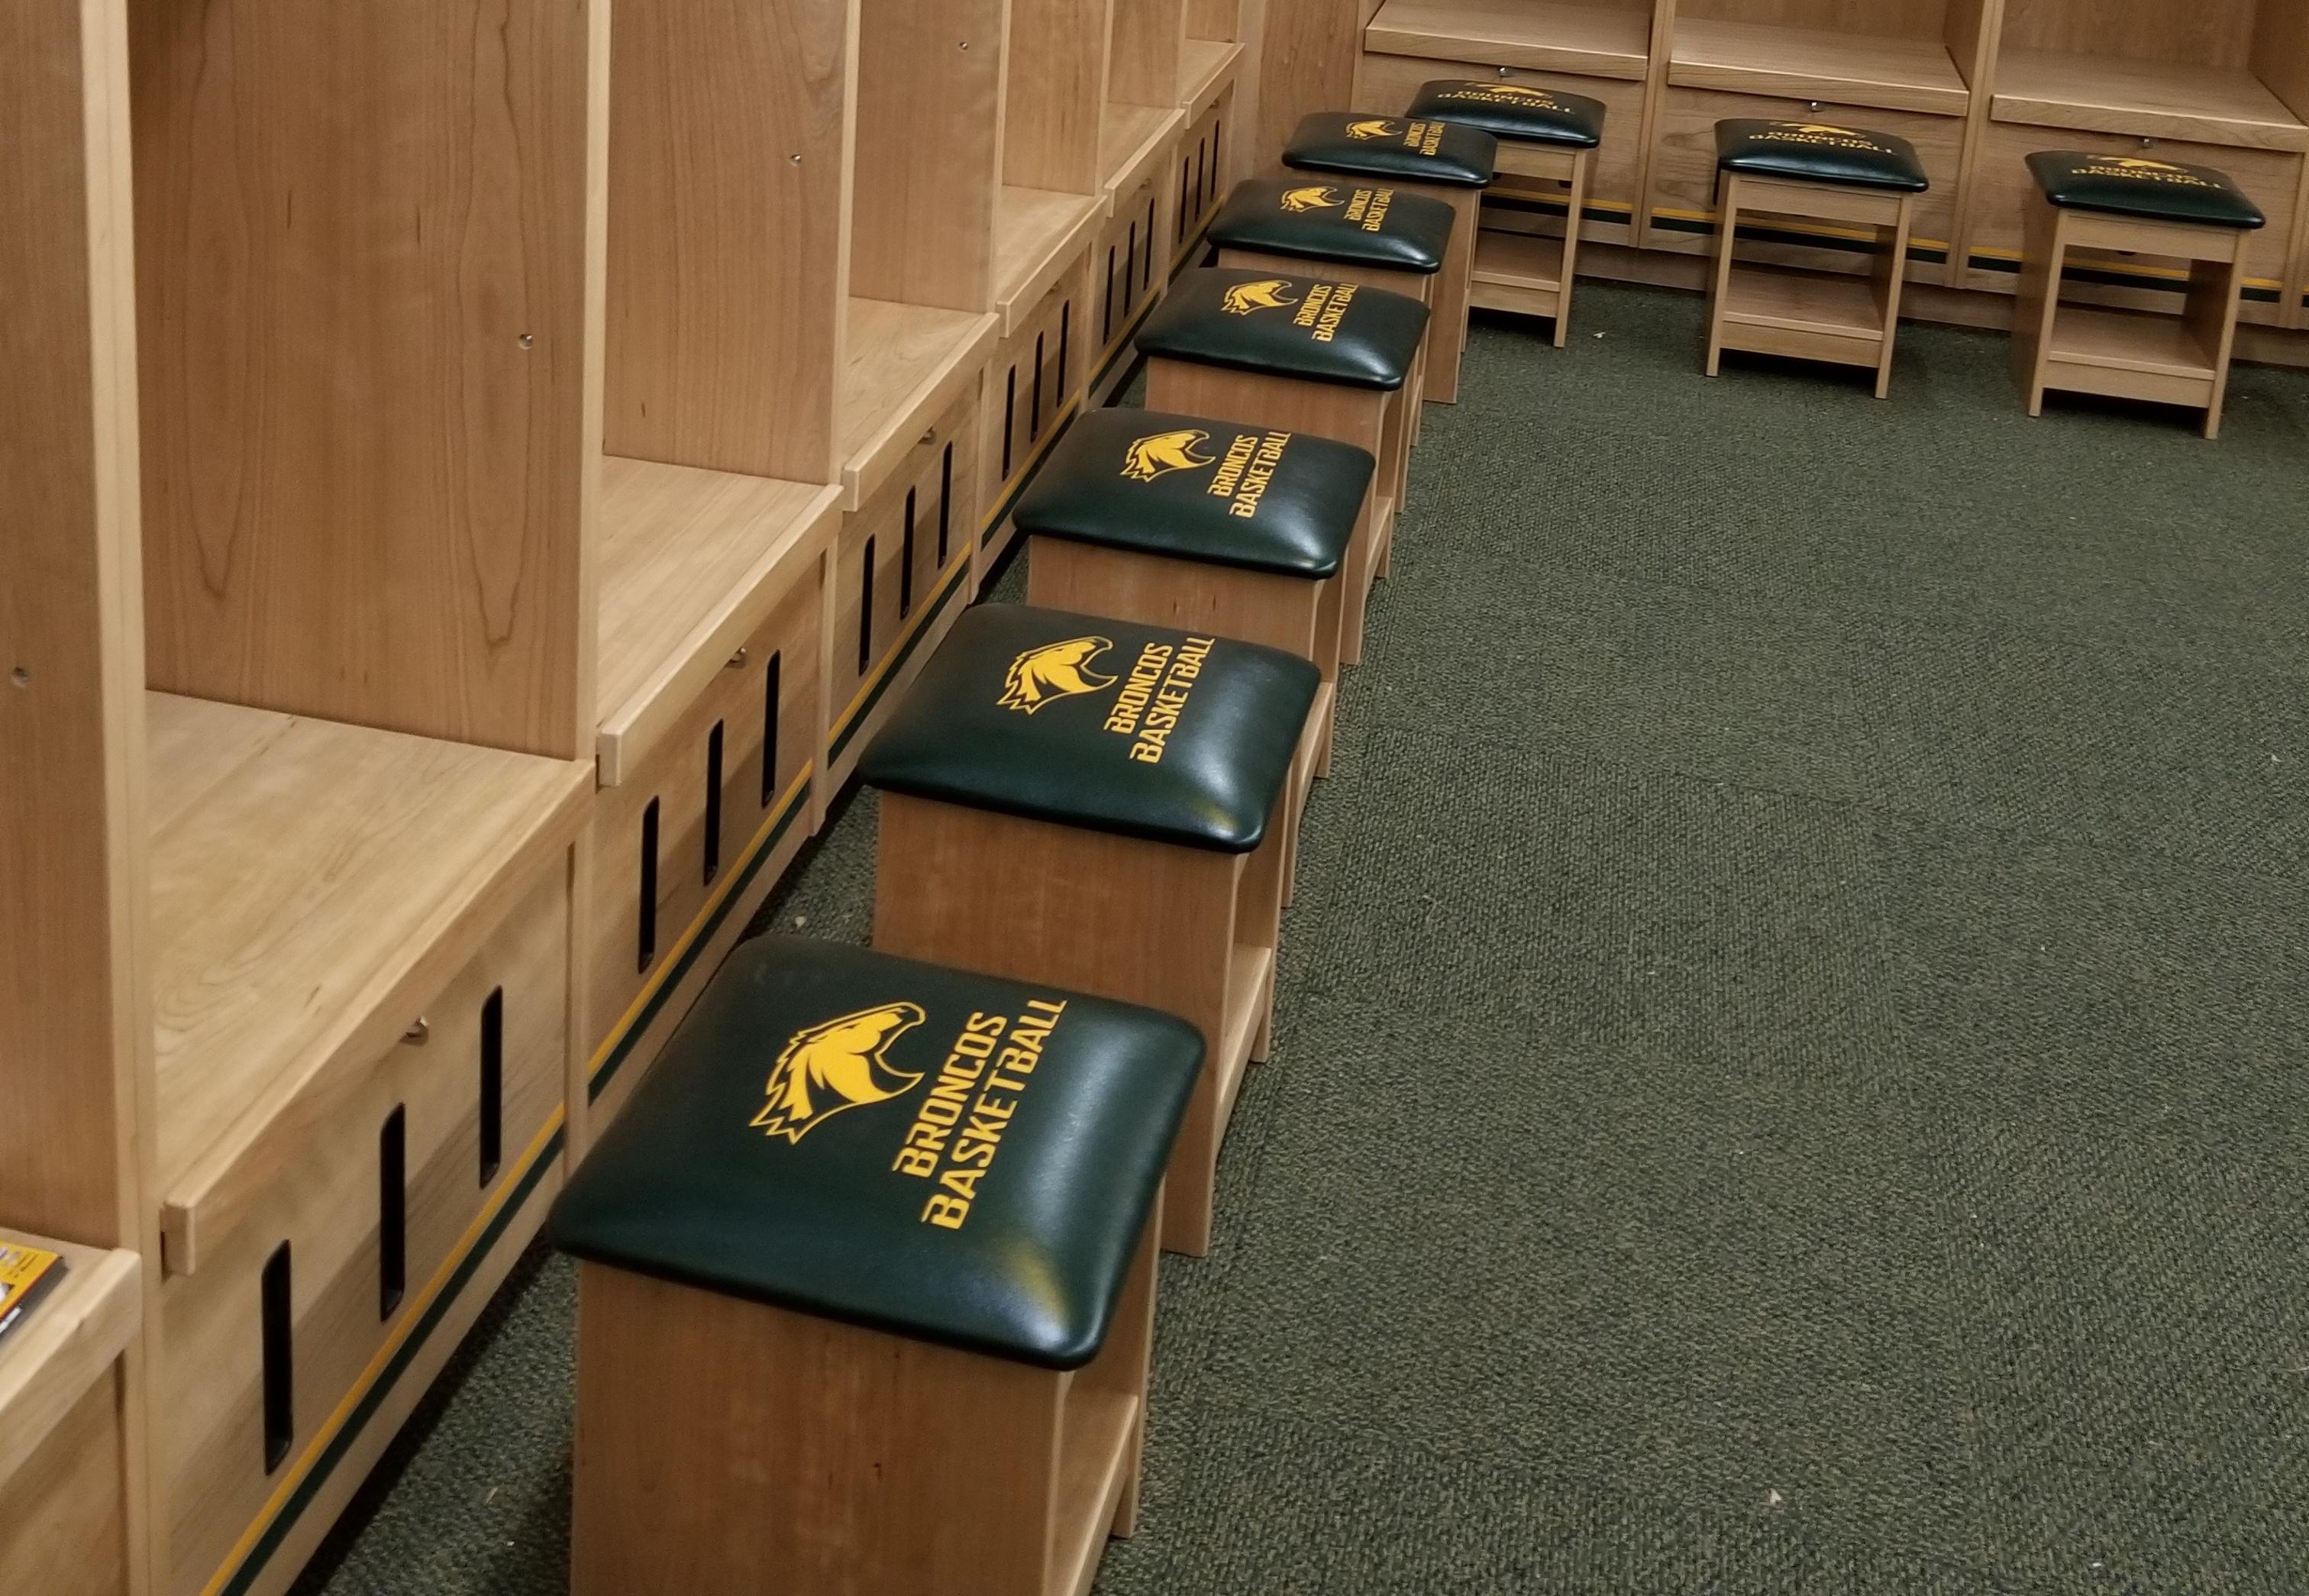 CalPoly_stools.jpg